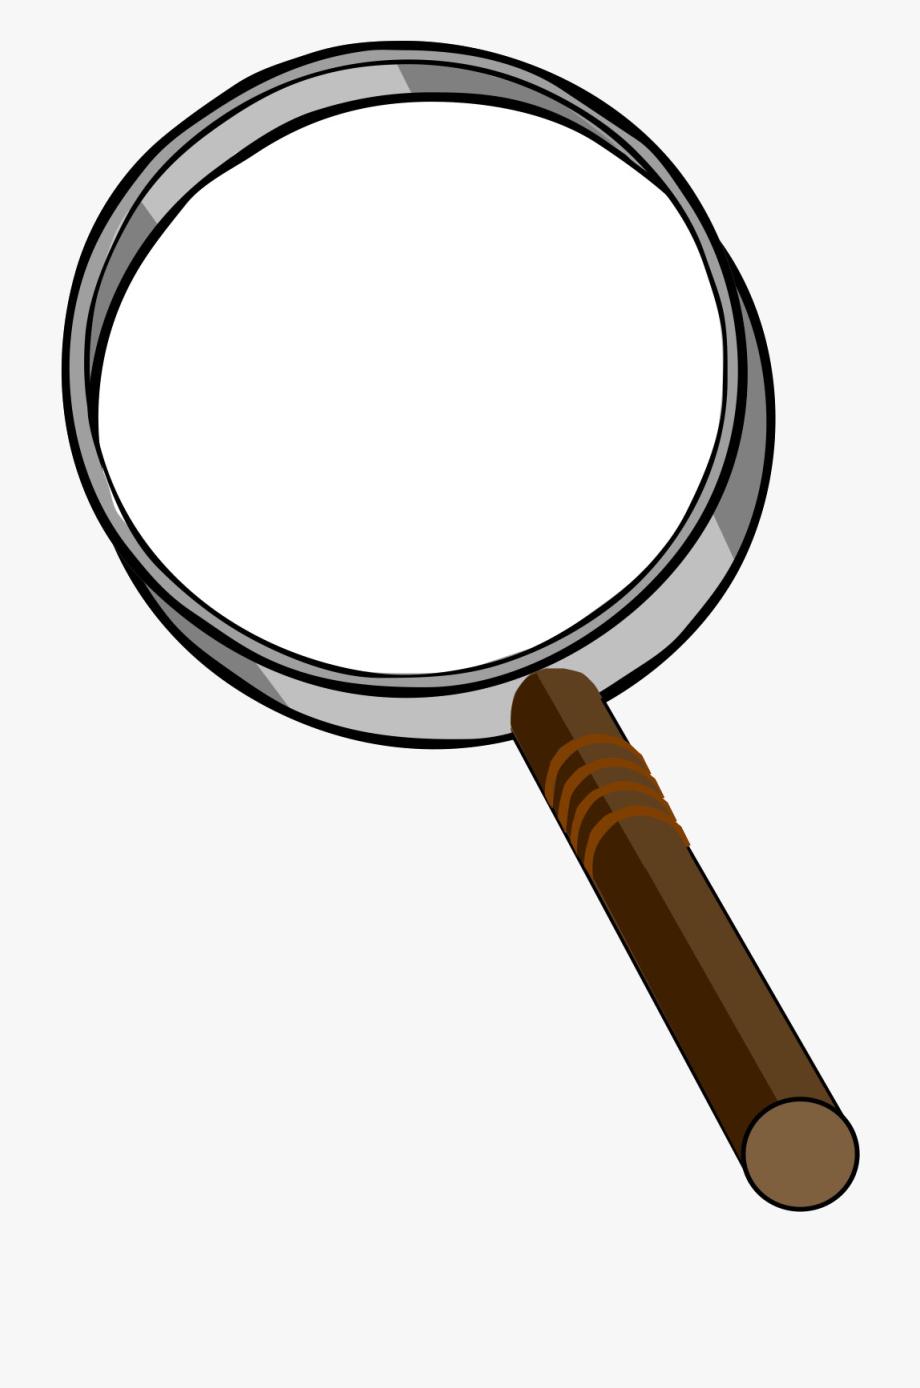 Magnifying Glass Magnifier Clip Art At Vector Transparent.